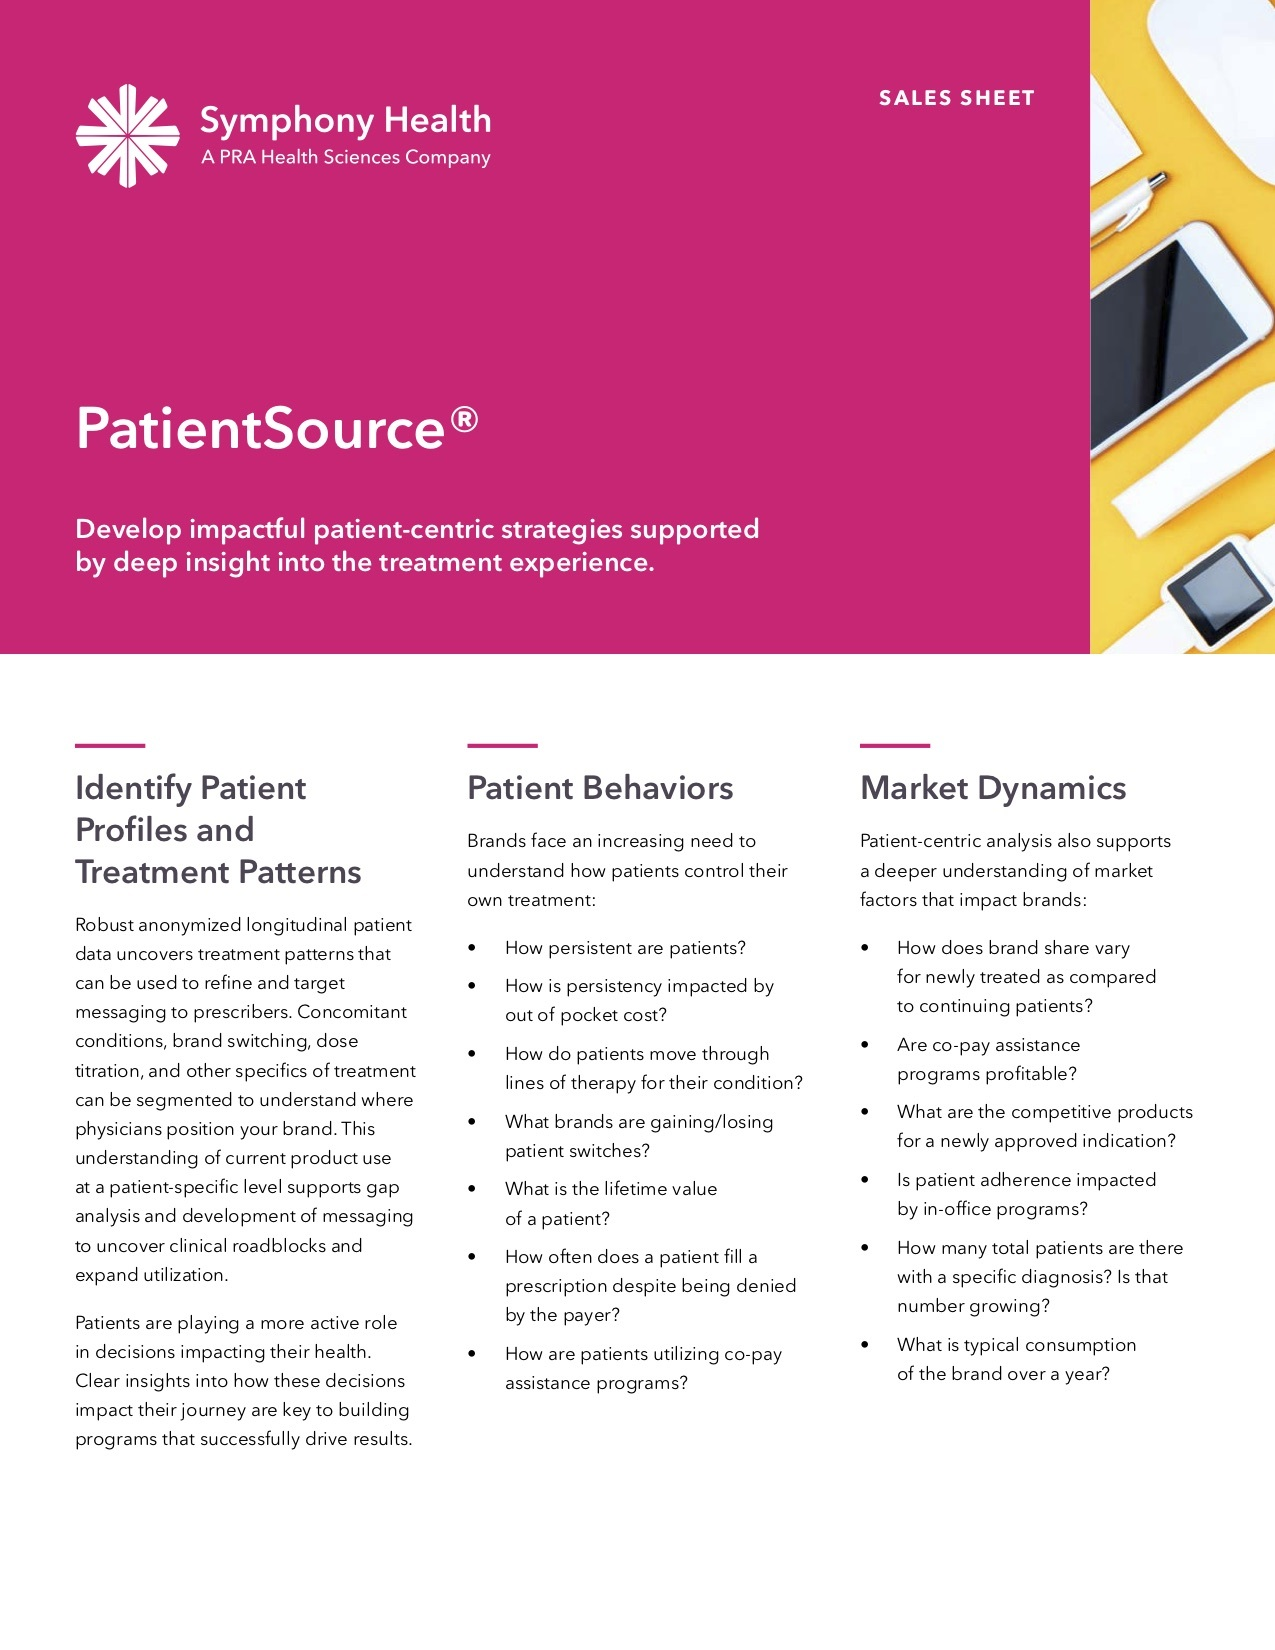 PatientSource® Sales Sheet